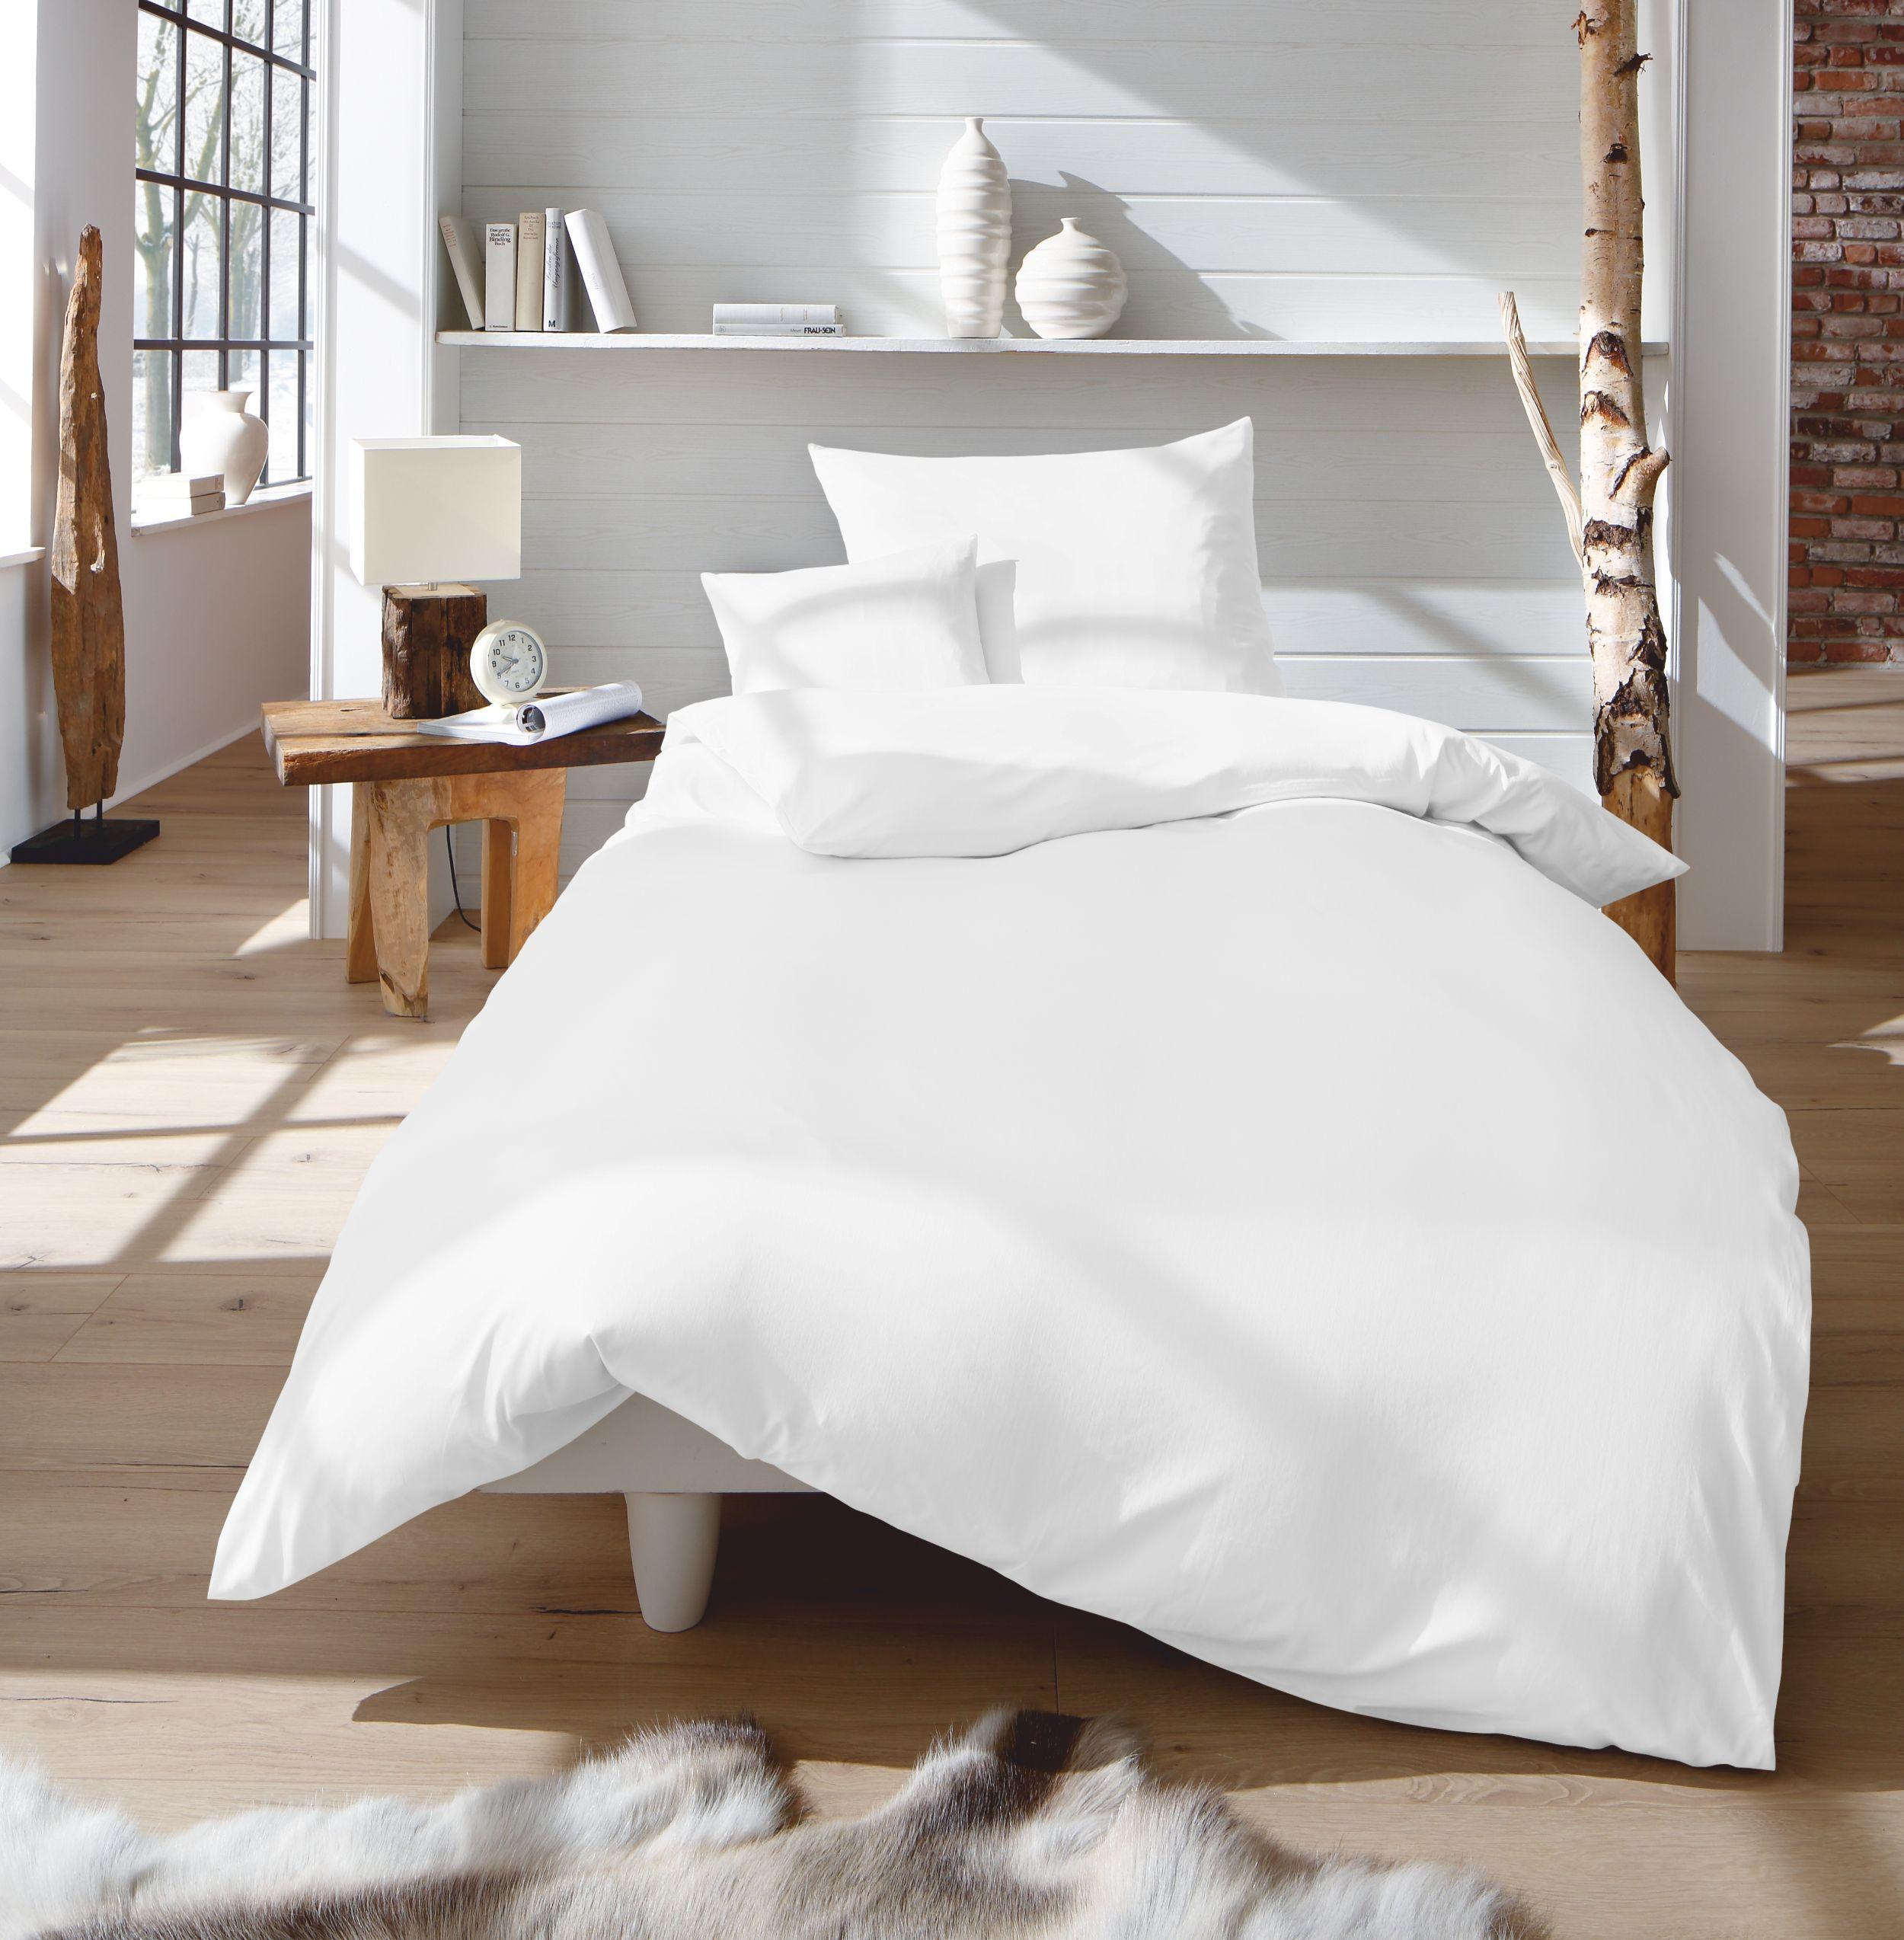 dream art riva bettw sche set baumwolle wei 135 x 200. Black Bedroom Furniture Sets. Home Design Ideas